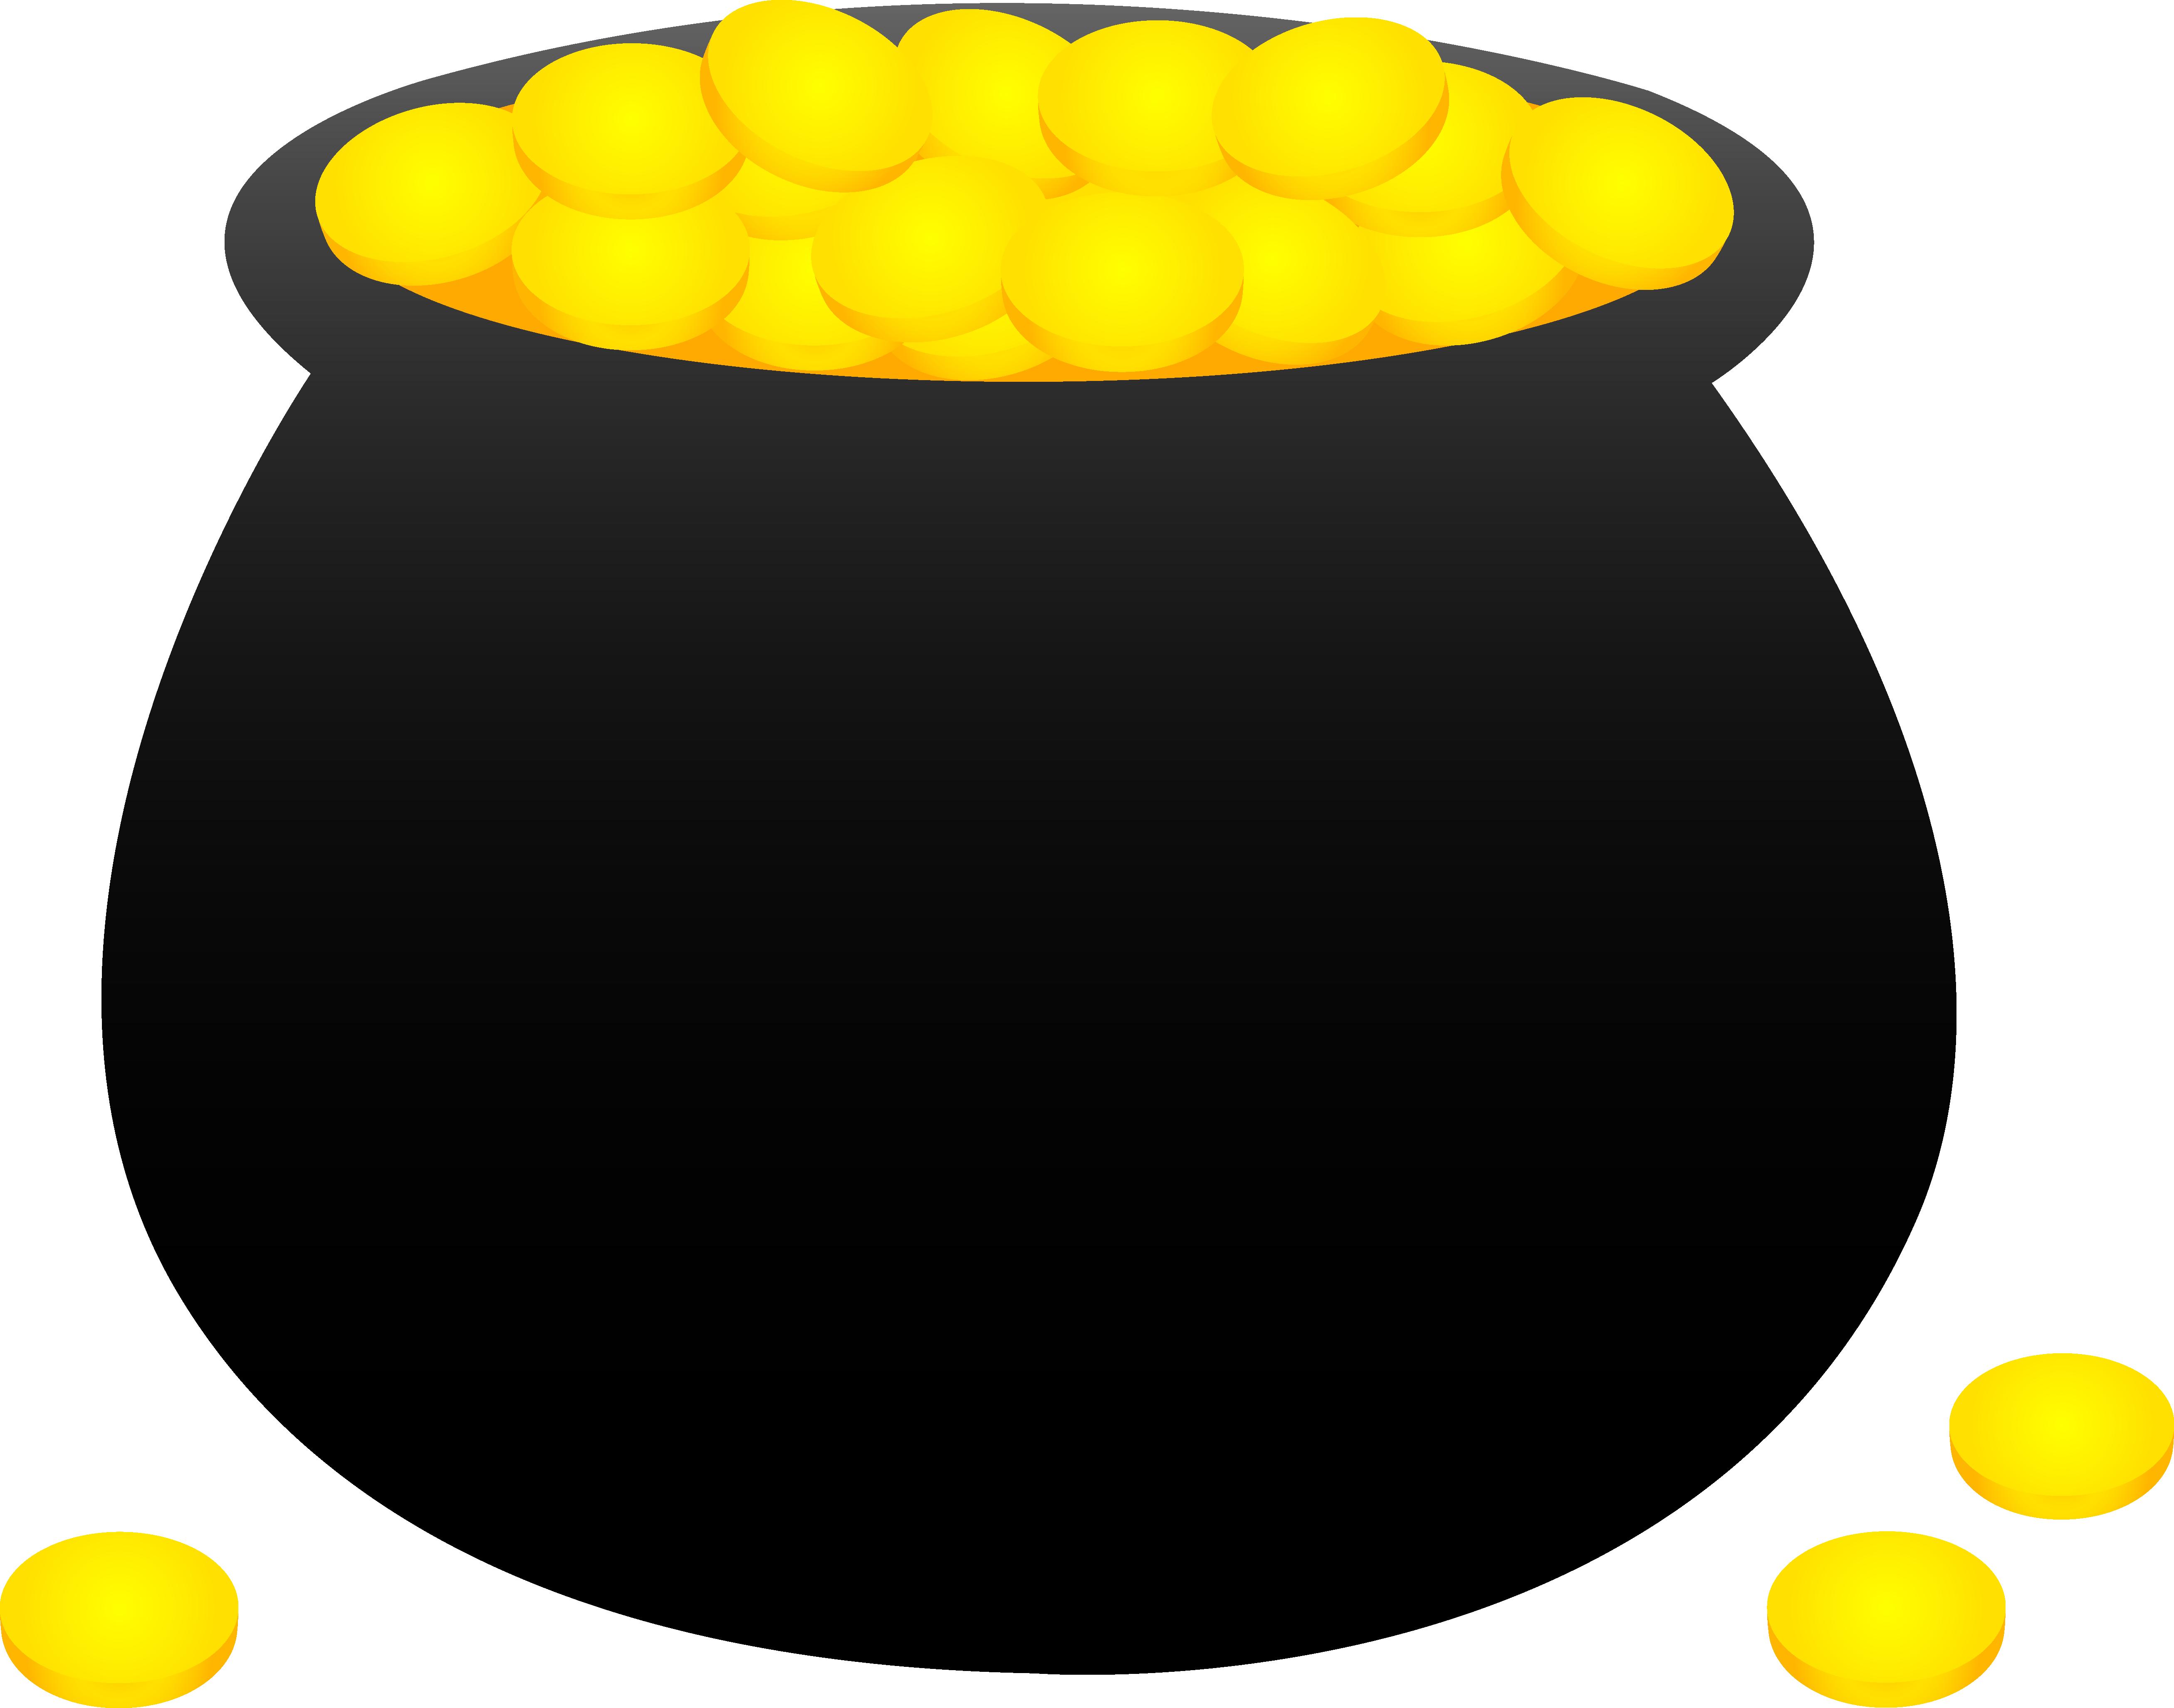 Coin clipart empty Cartoon Cartoon Clipart Pot Pot